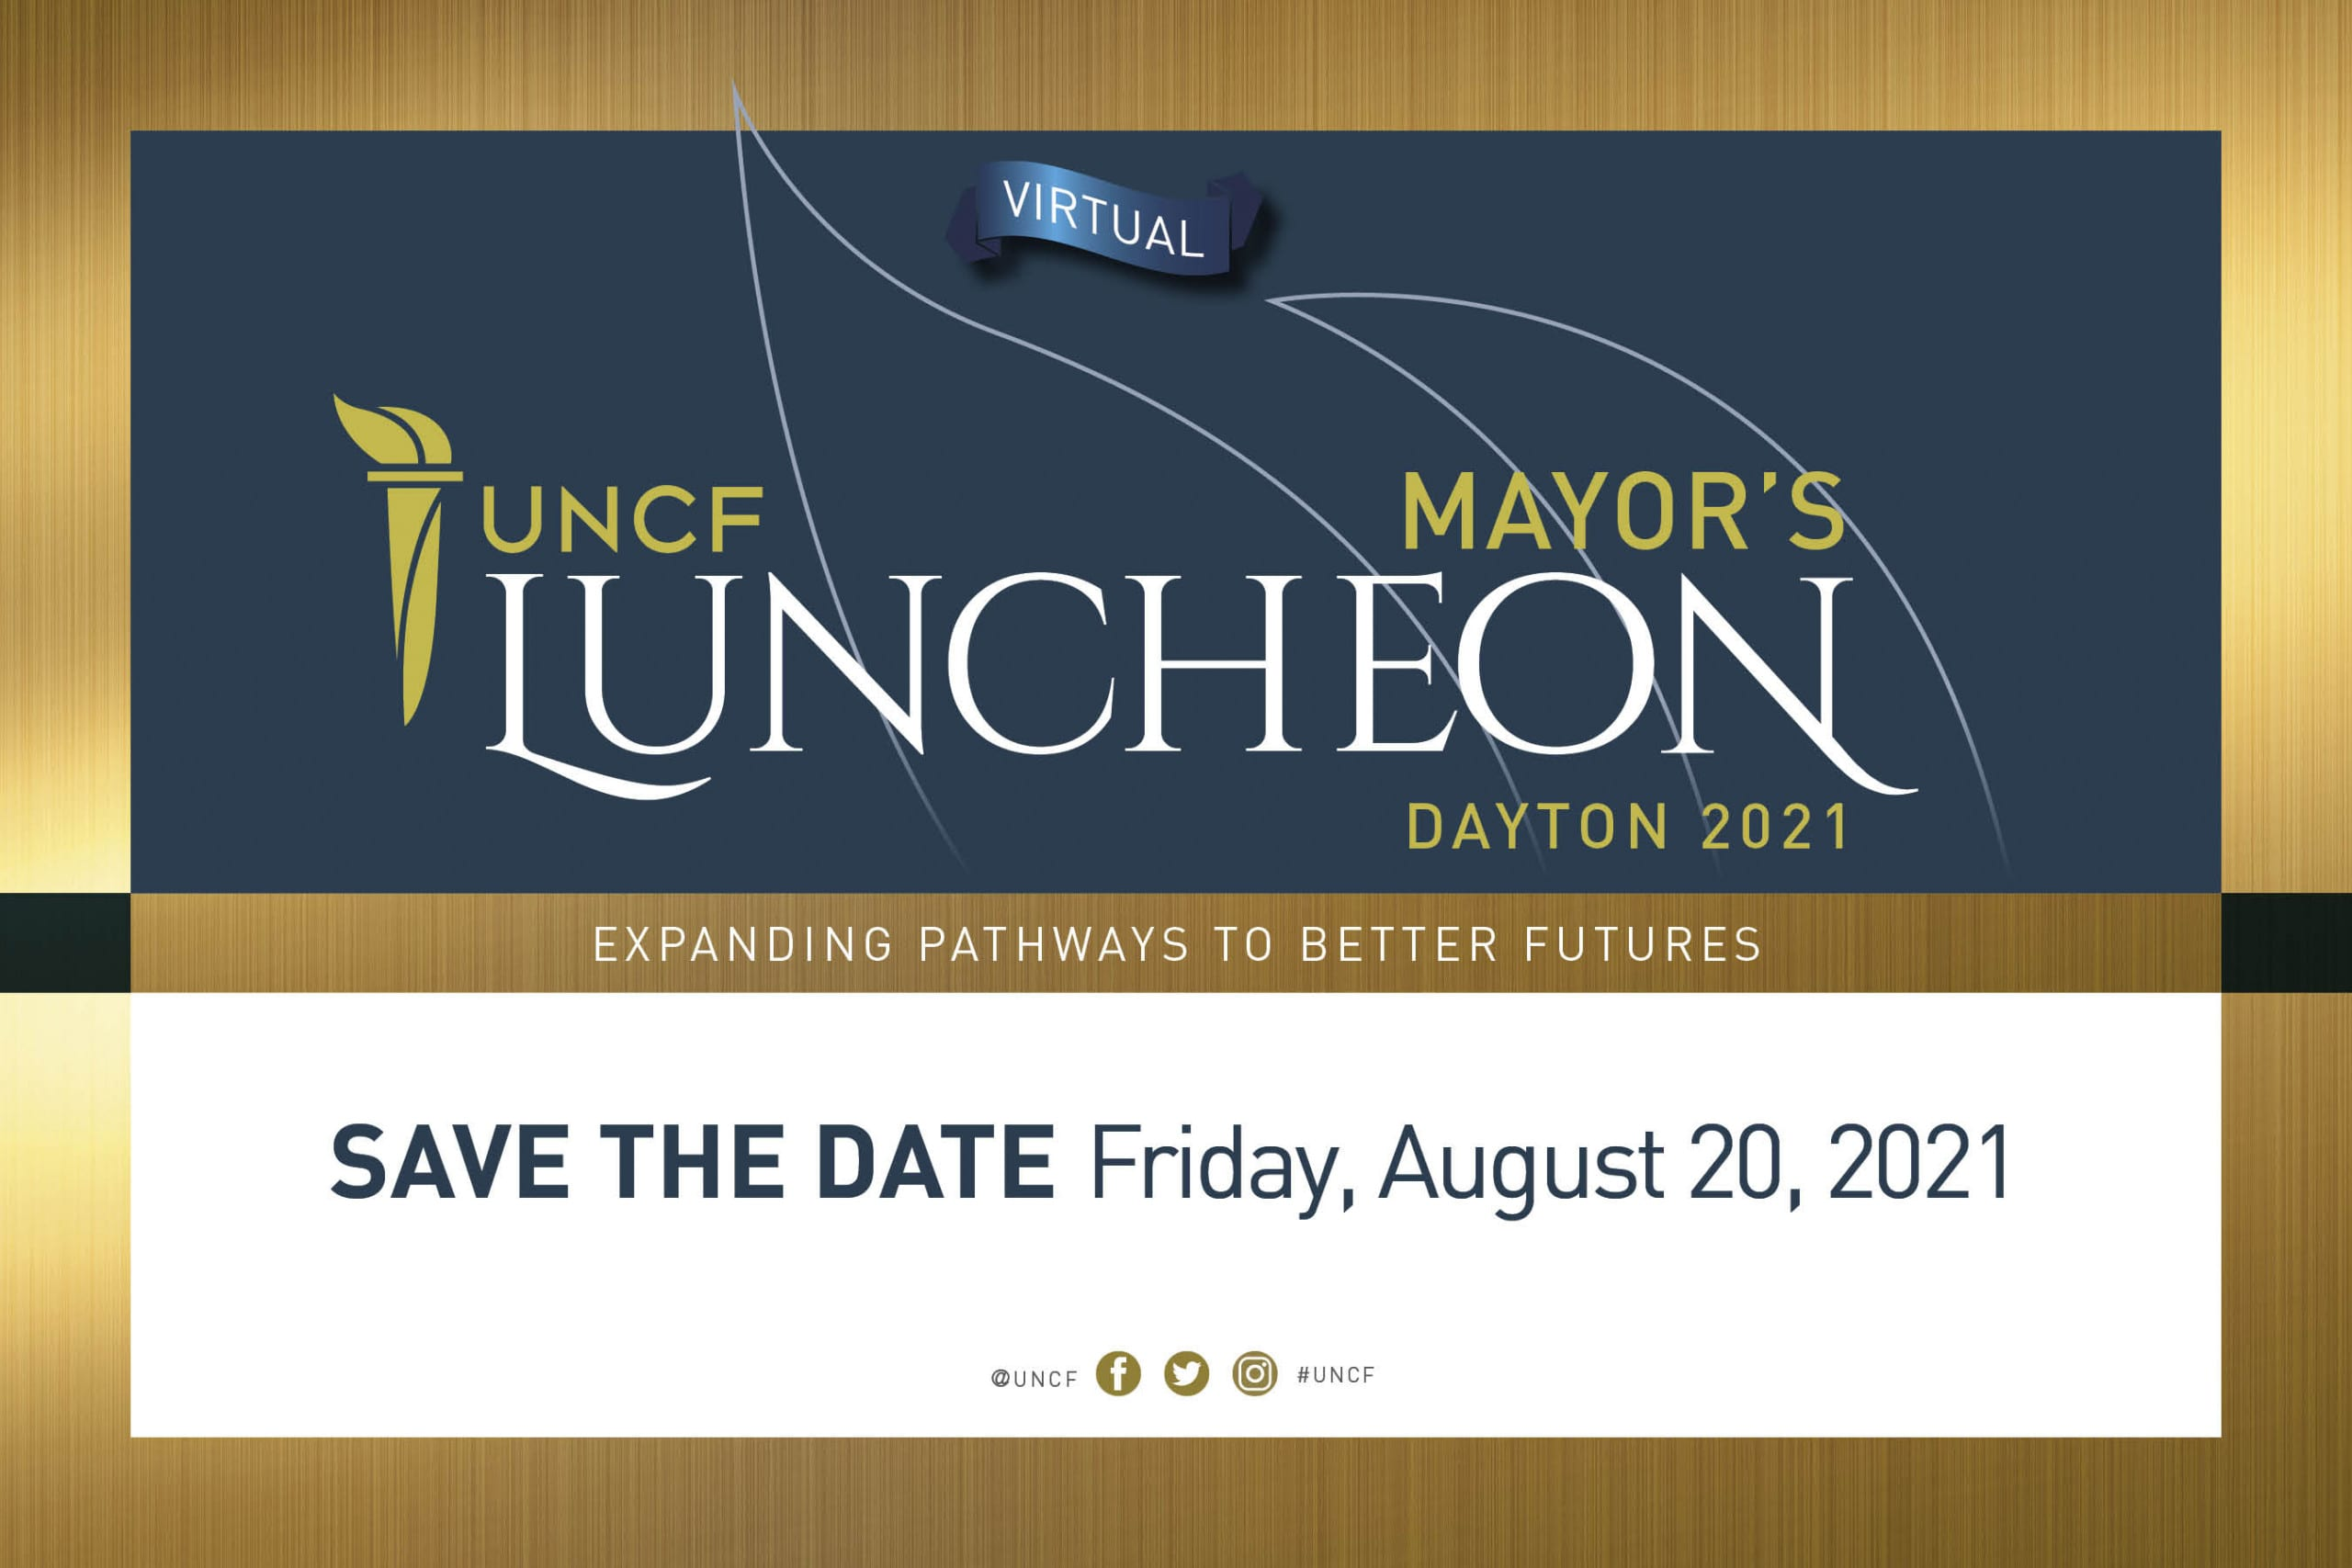 2021 Virtual Mayor's Luncheon – Dayton